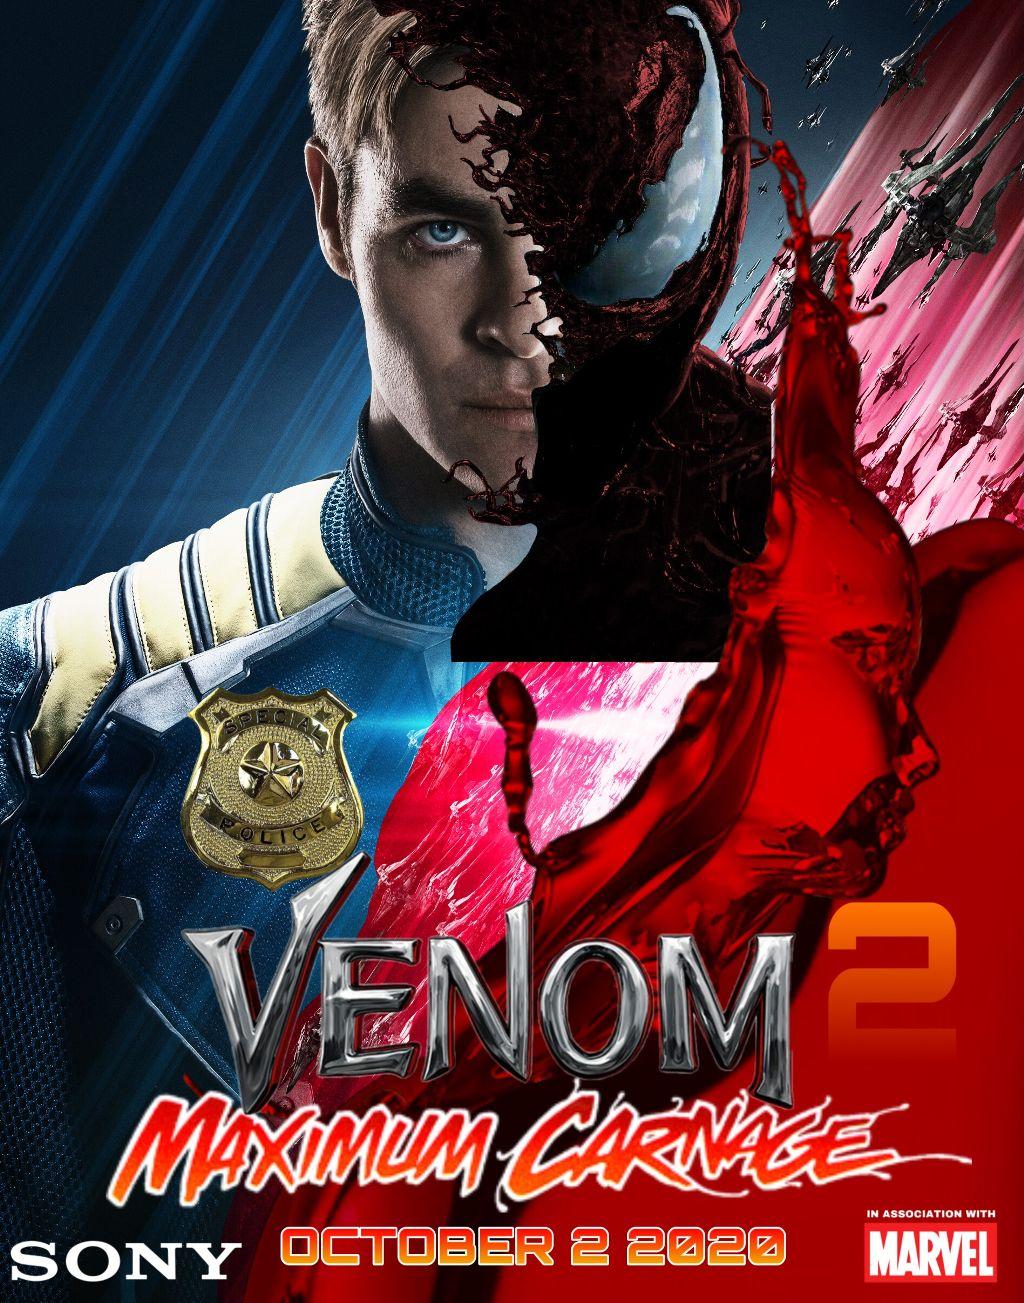 Toxin Venom Carnage Venom 2 Maximum Carnage Movie 2020